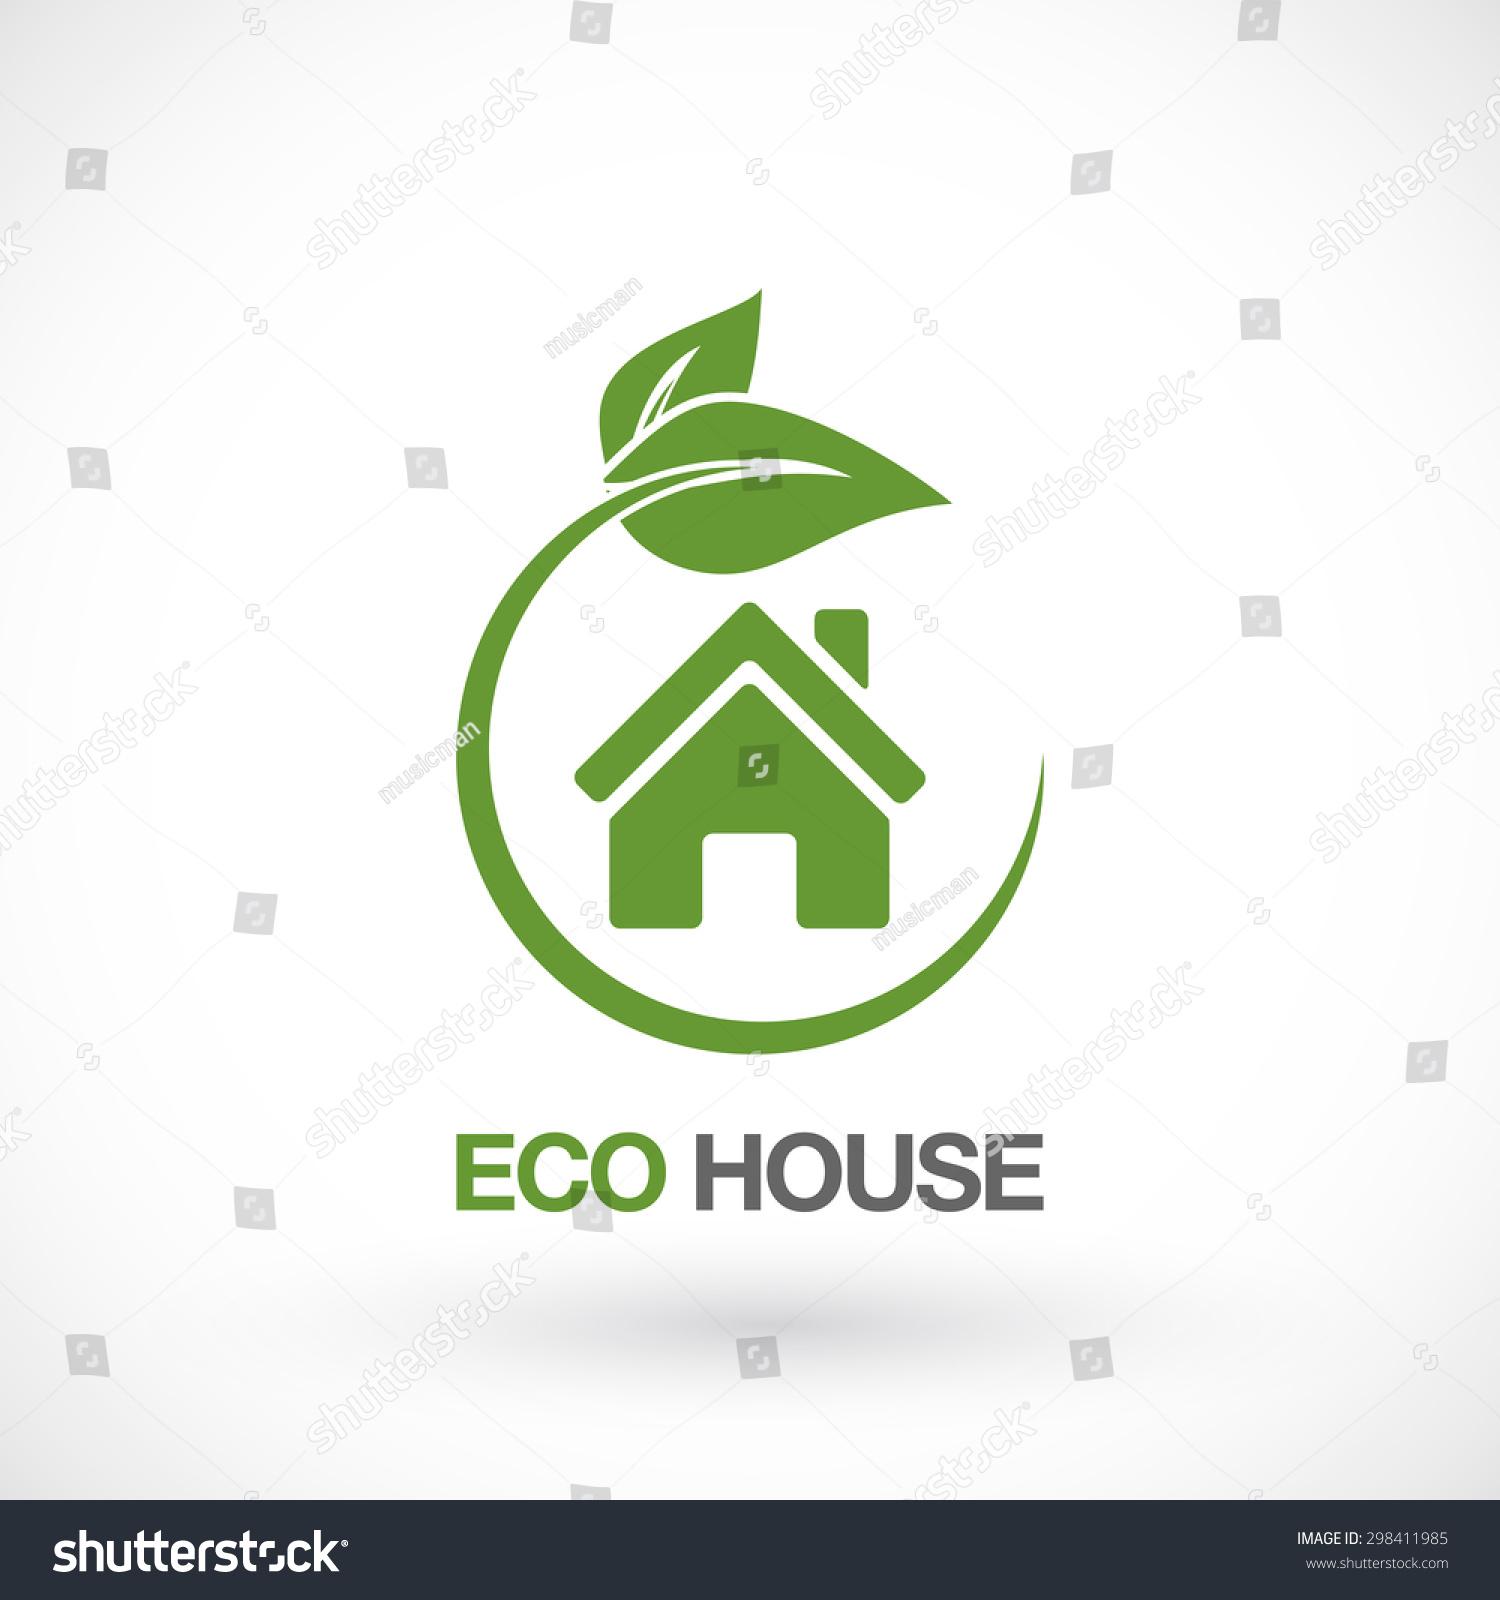 Real estate eco house logo design stock vector 298411985 for House logo design free